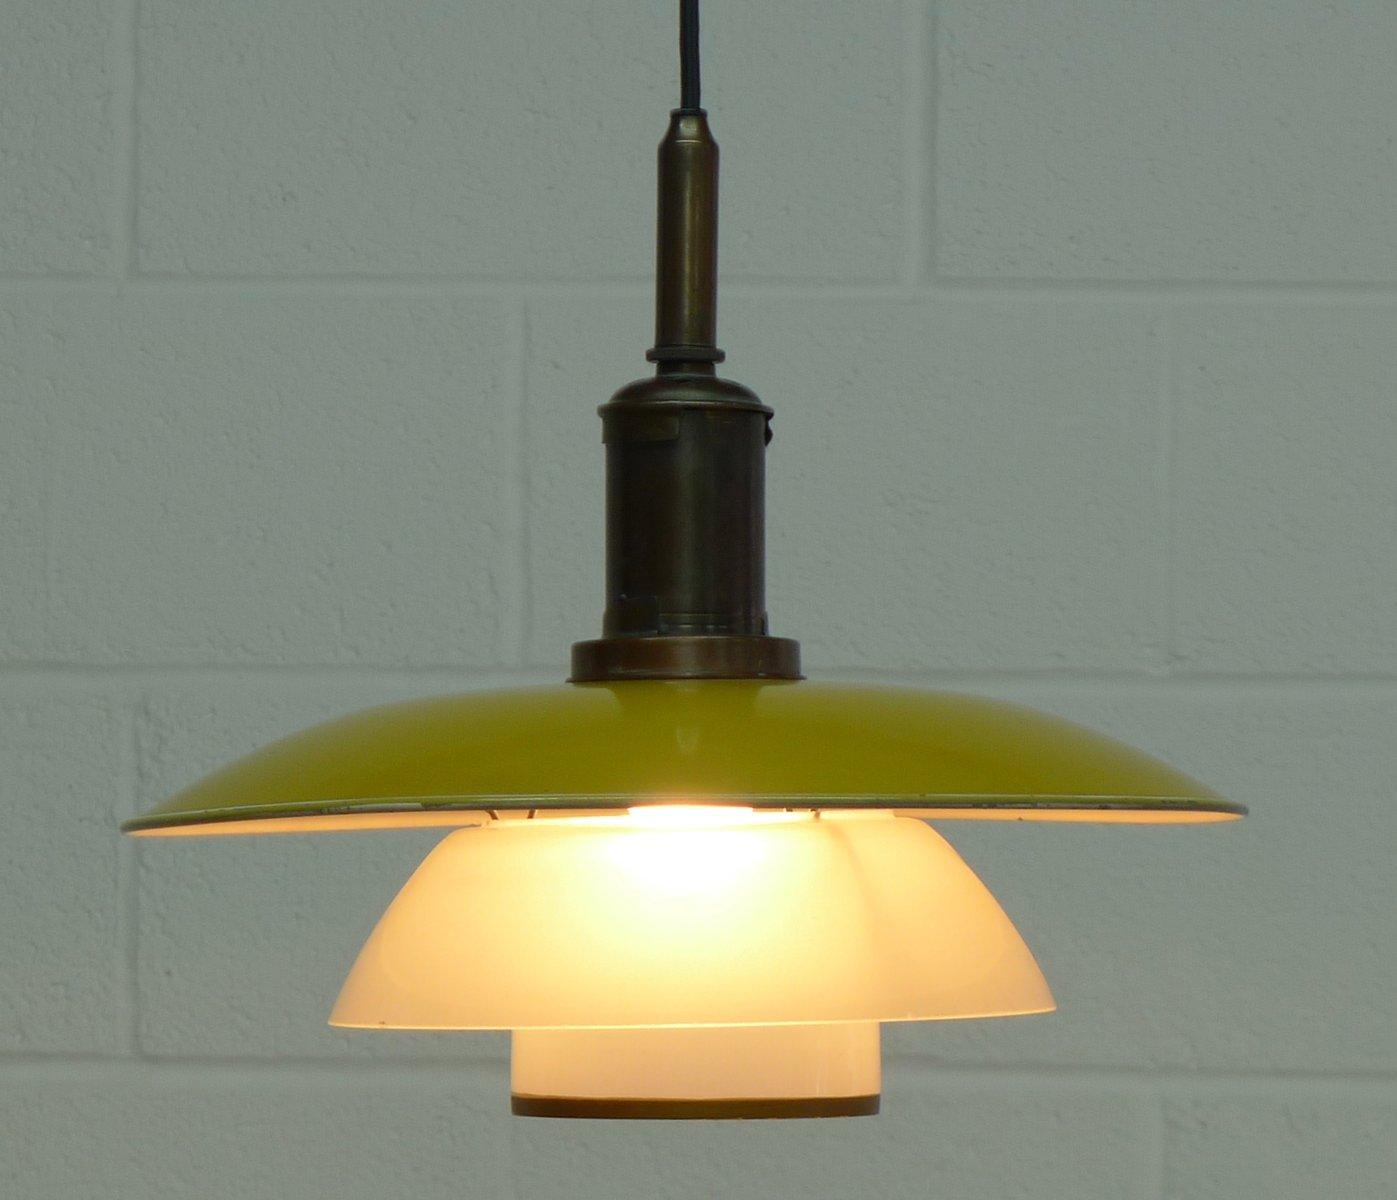 vintage pendant lamp by poul henningsen for louis poulsen for sale at pamono. Black Bedroom Furniture Sets. Home Design Ideas